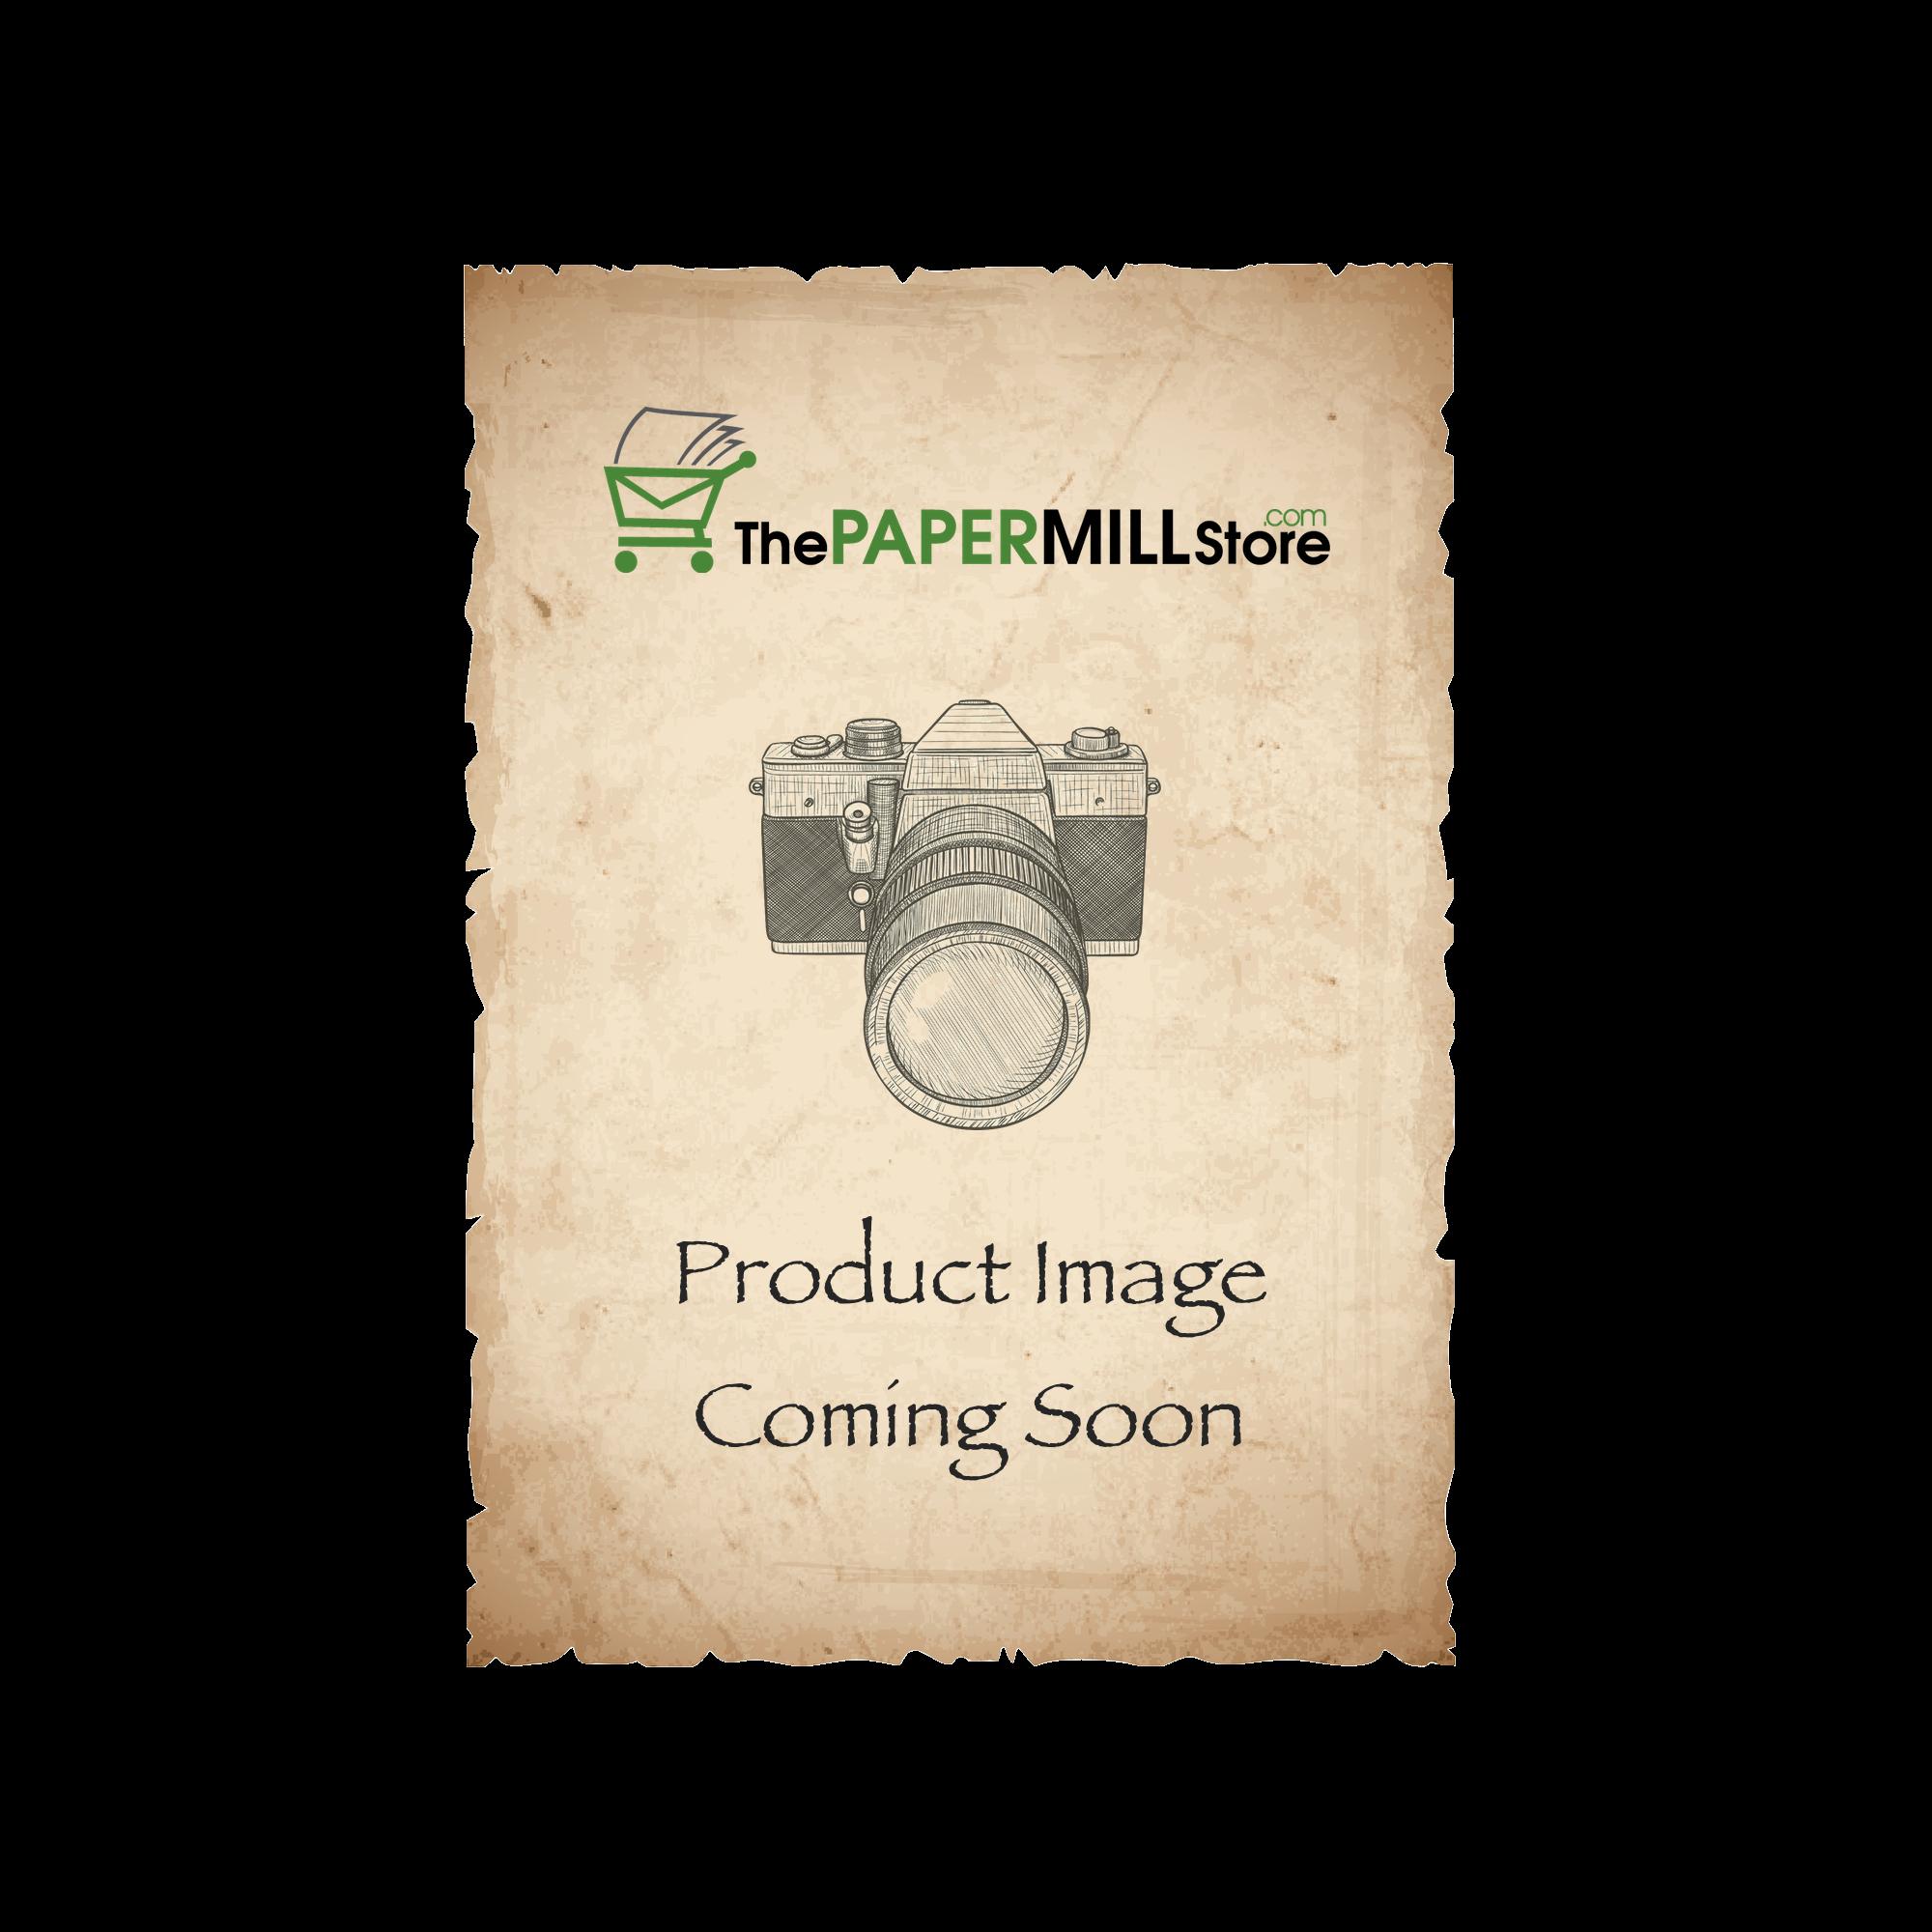 Astrobrights Fireball Fuchsia Paper - 8 1/2 x 11 in 60 lb Text Smooth 500 per Ream